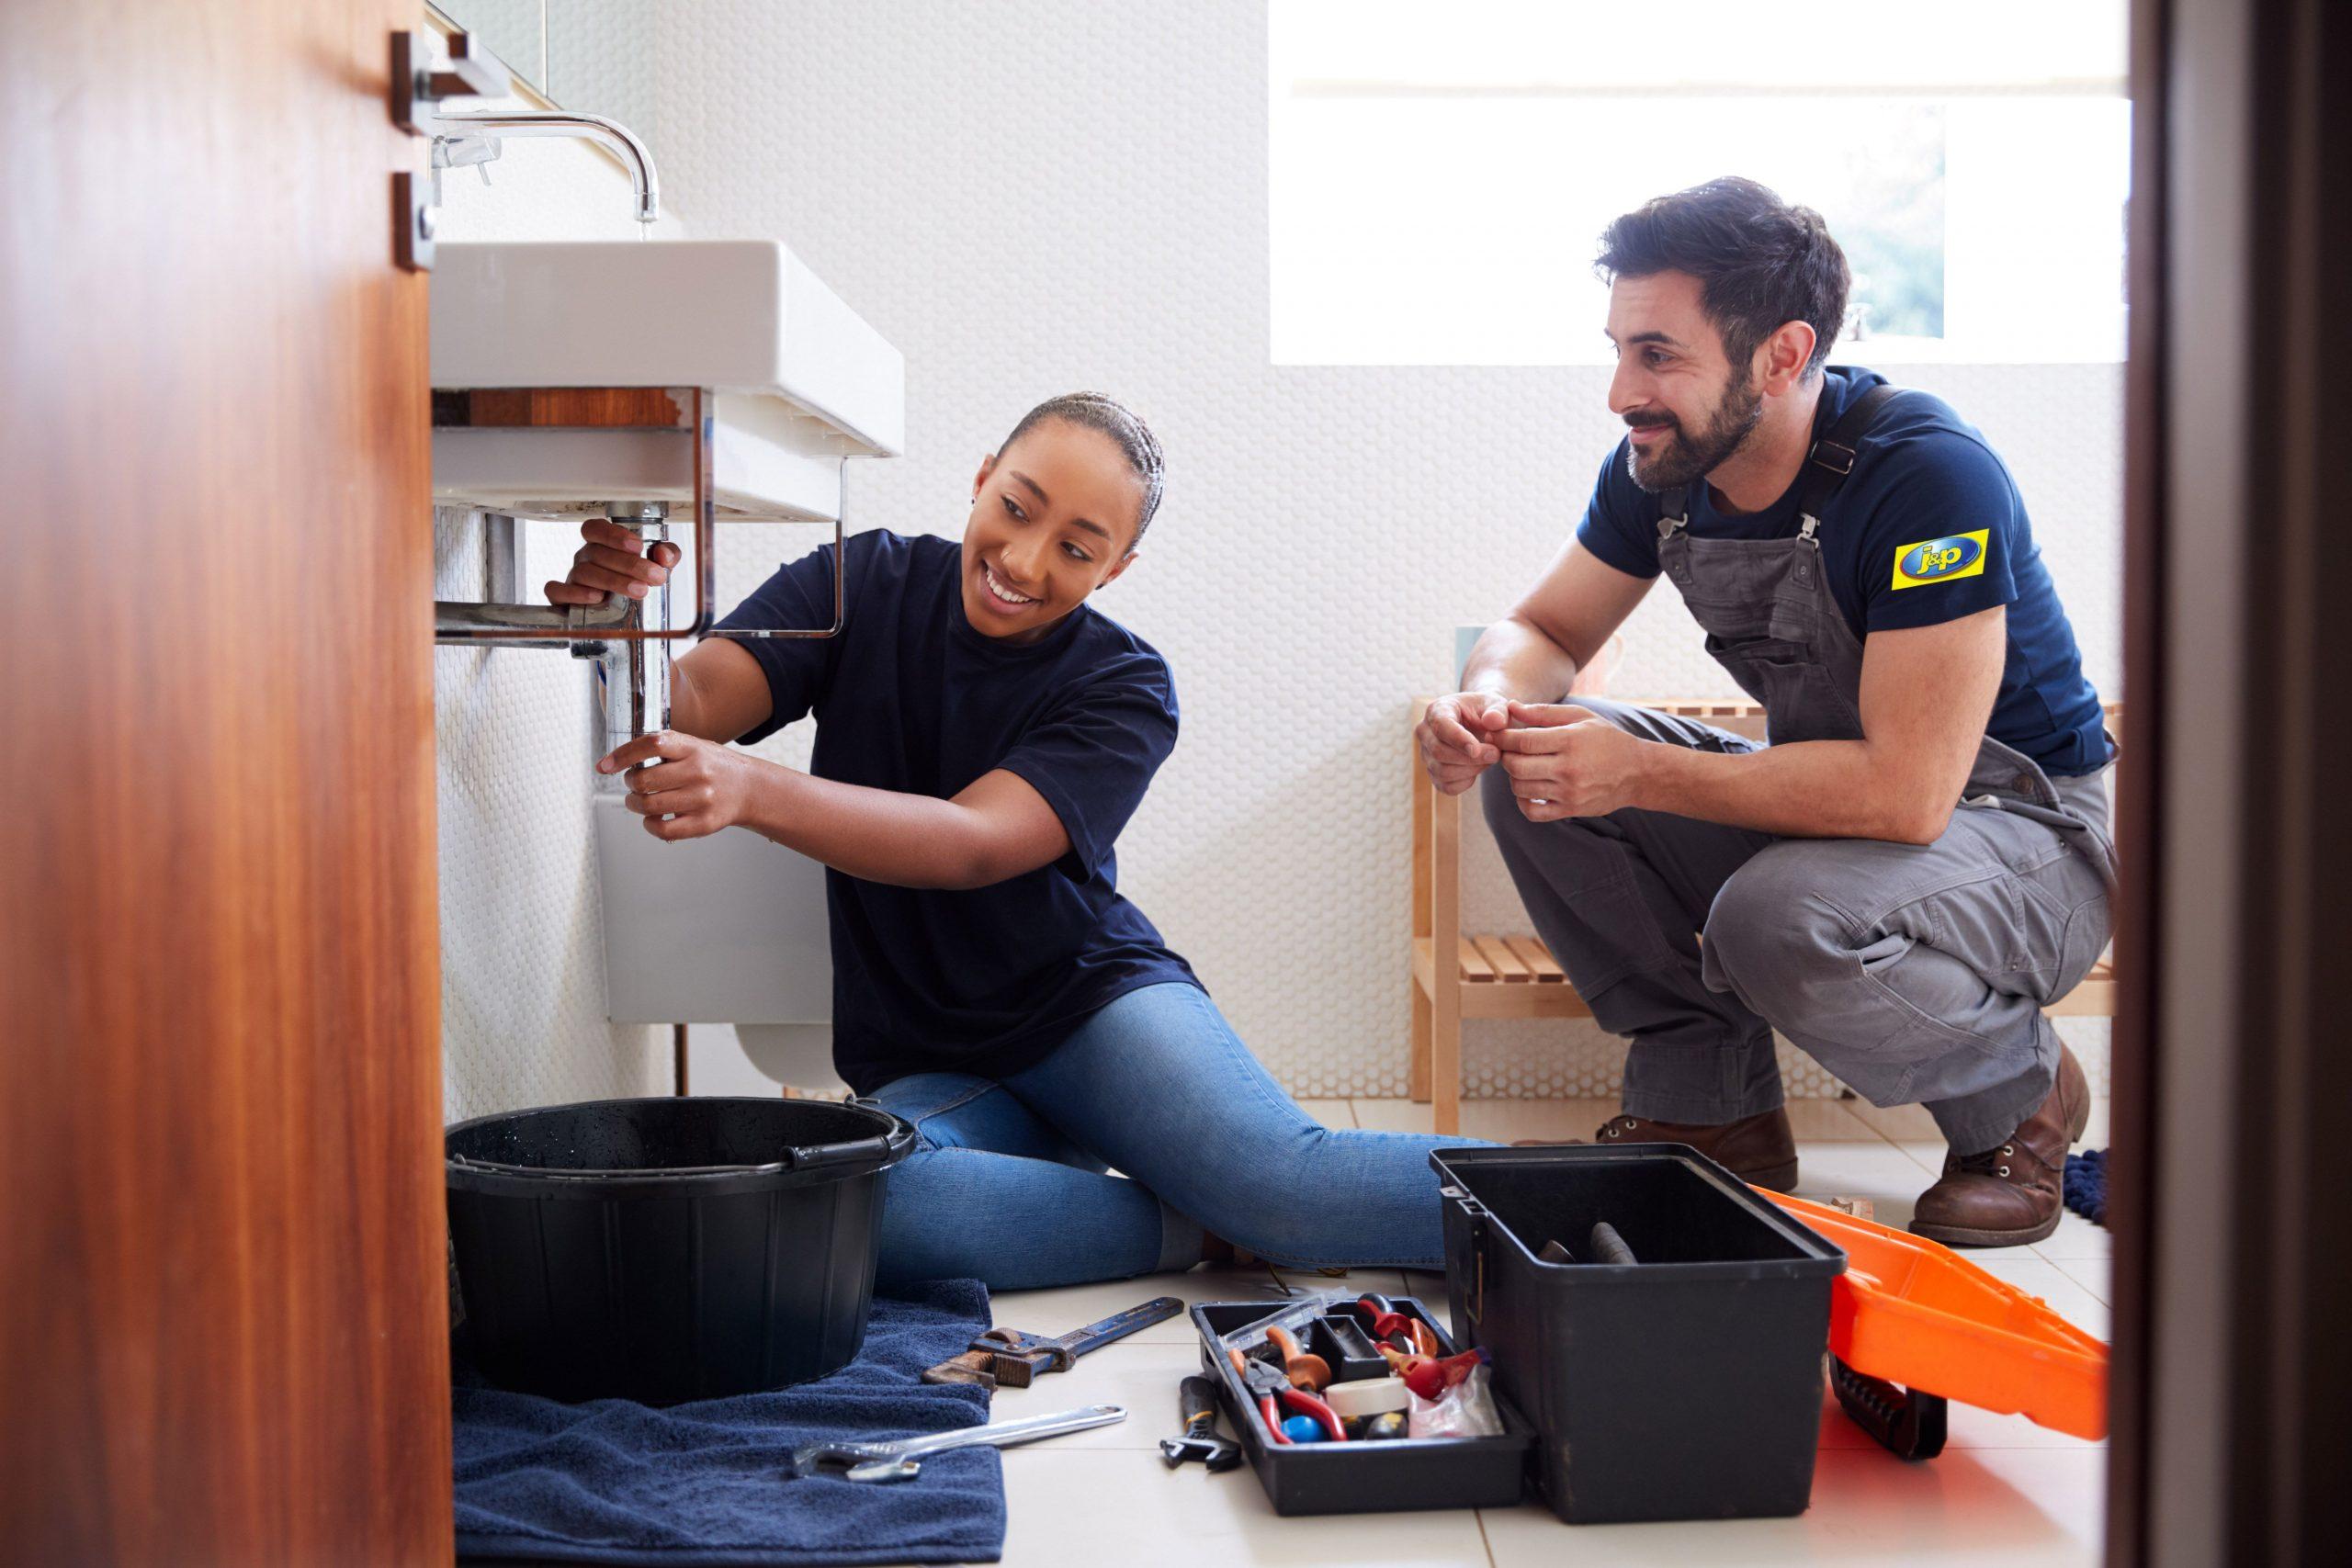 Male Plumber Teaching Female Apprentice To Fix Leaking Sink In Home Bathroom